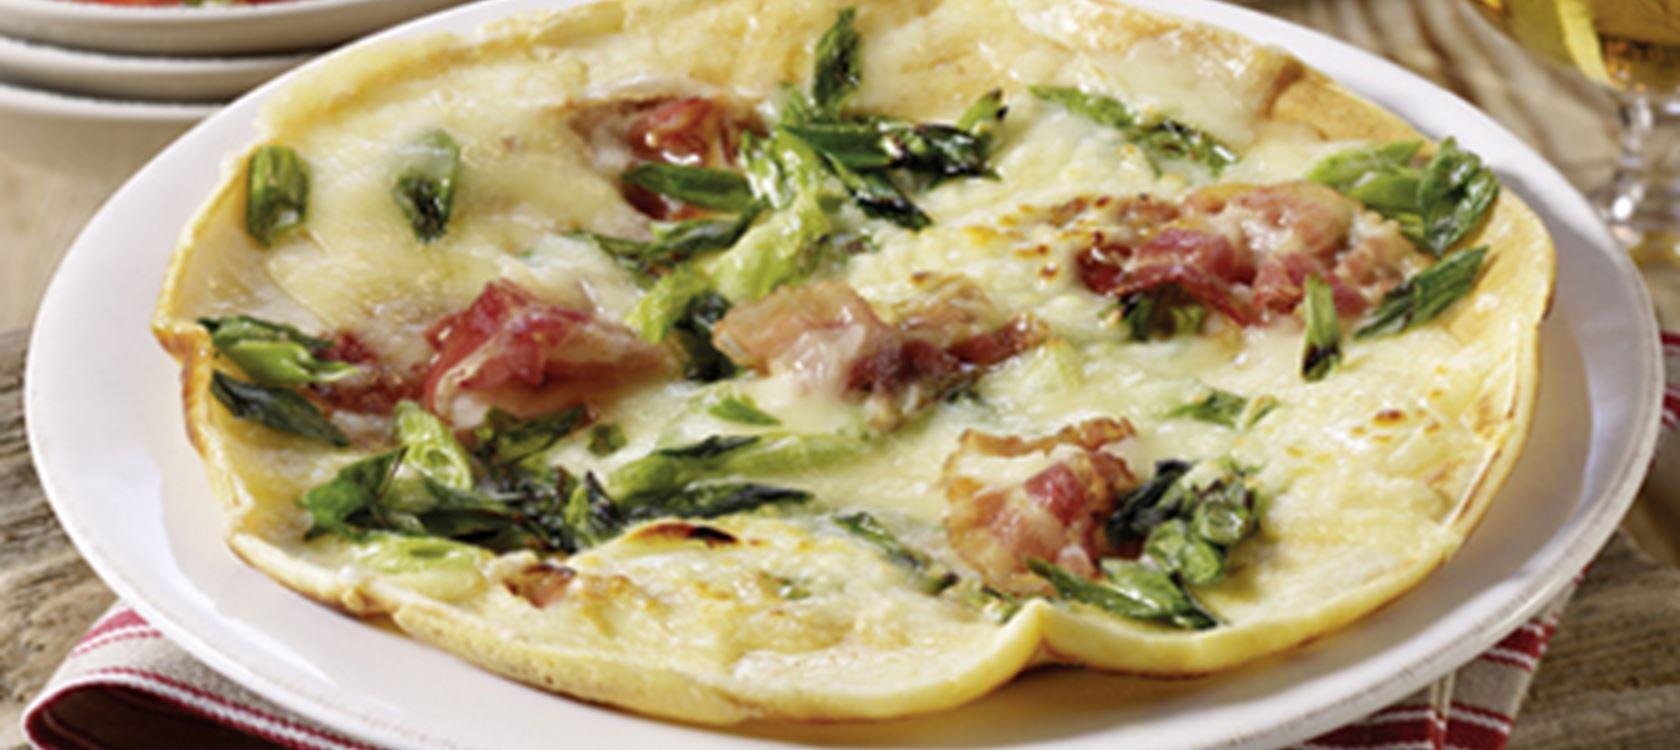 Käse-Speck-Pfannkuchen mit Tomatensalat